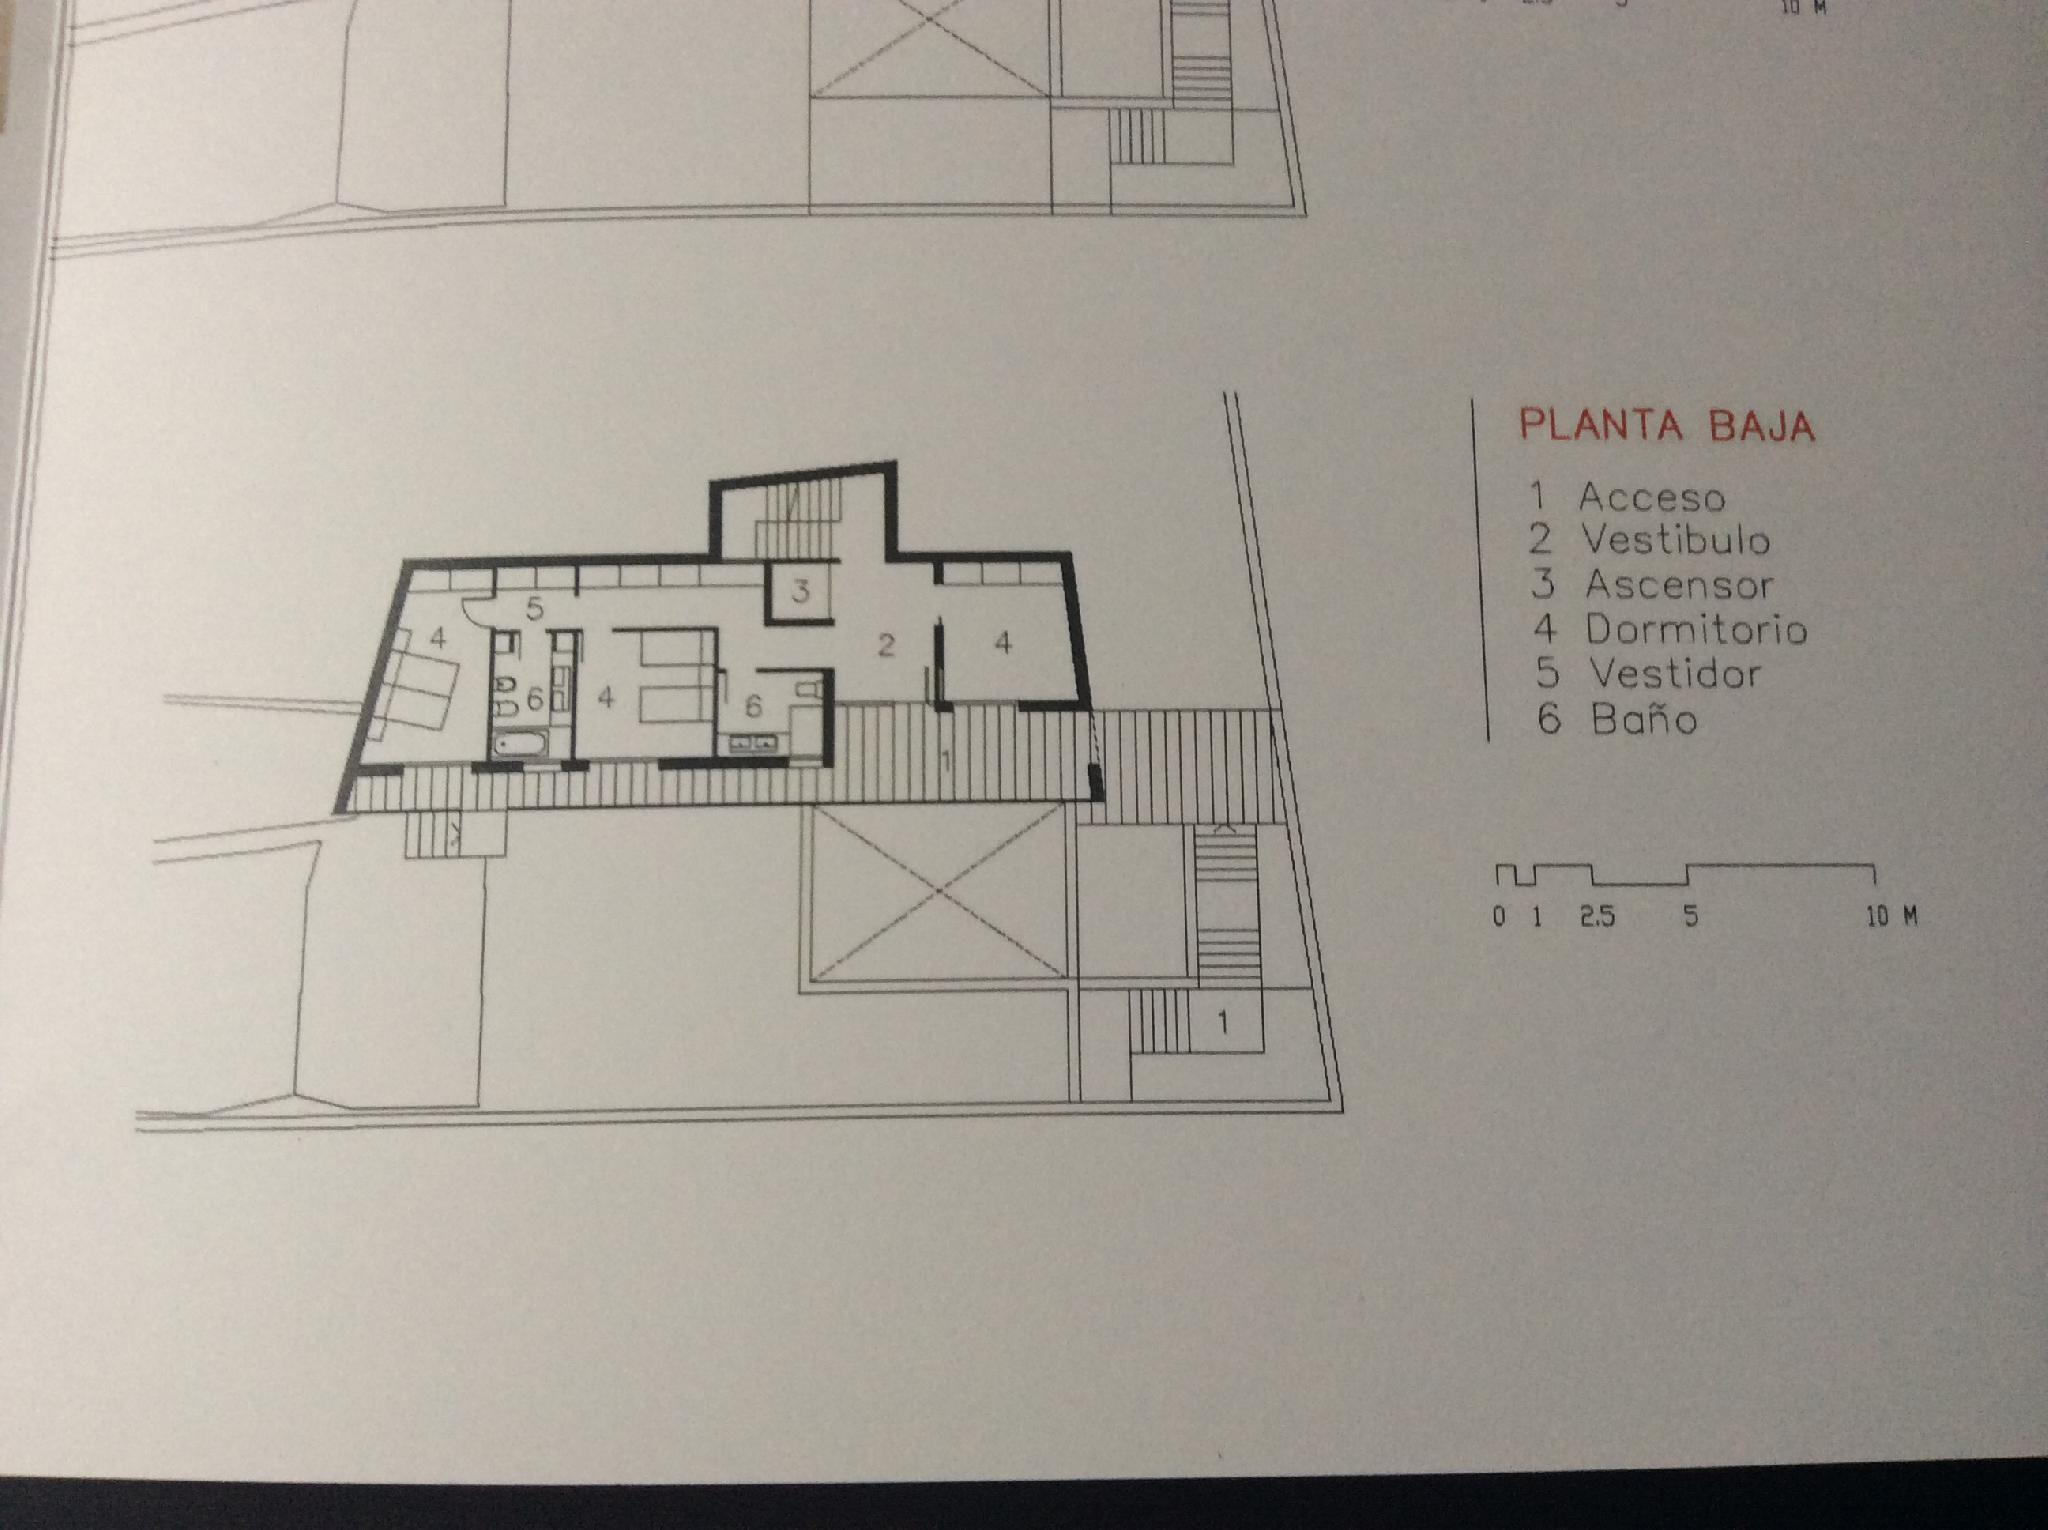 100069 Solar Urbano en venda en Sarrià-Sant Gervasi, Tres Torres 7